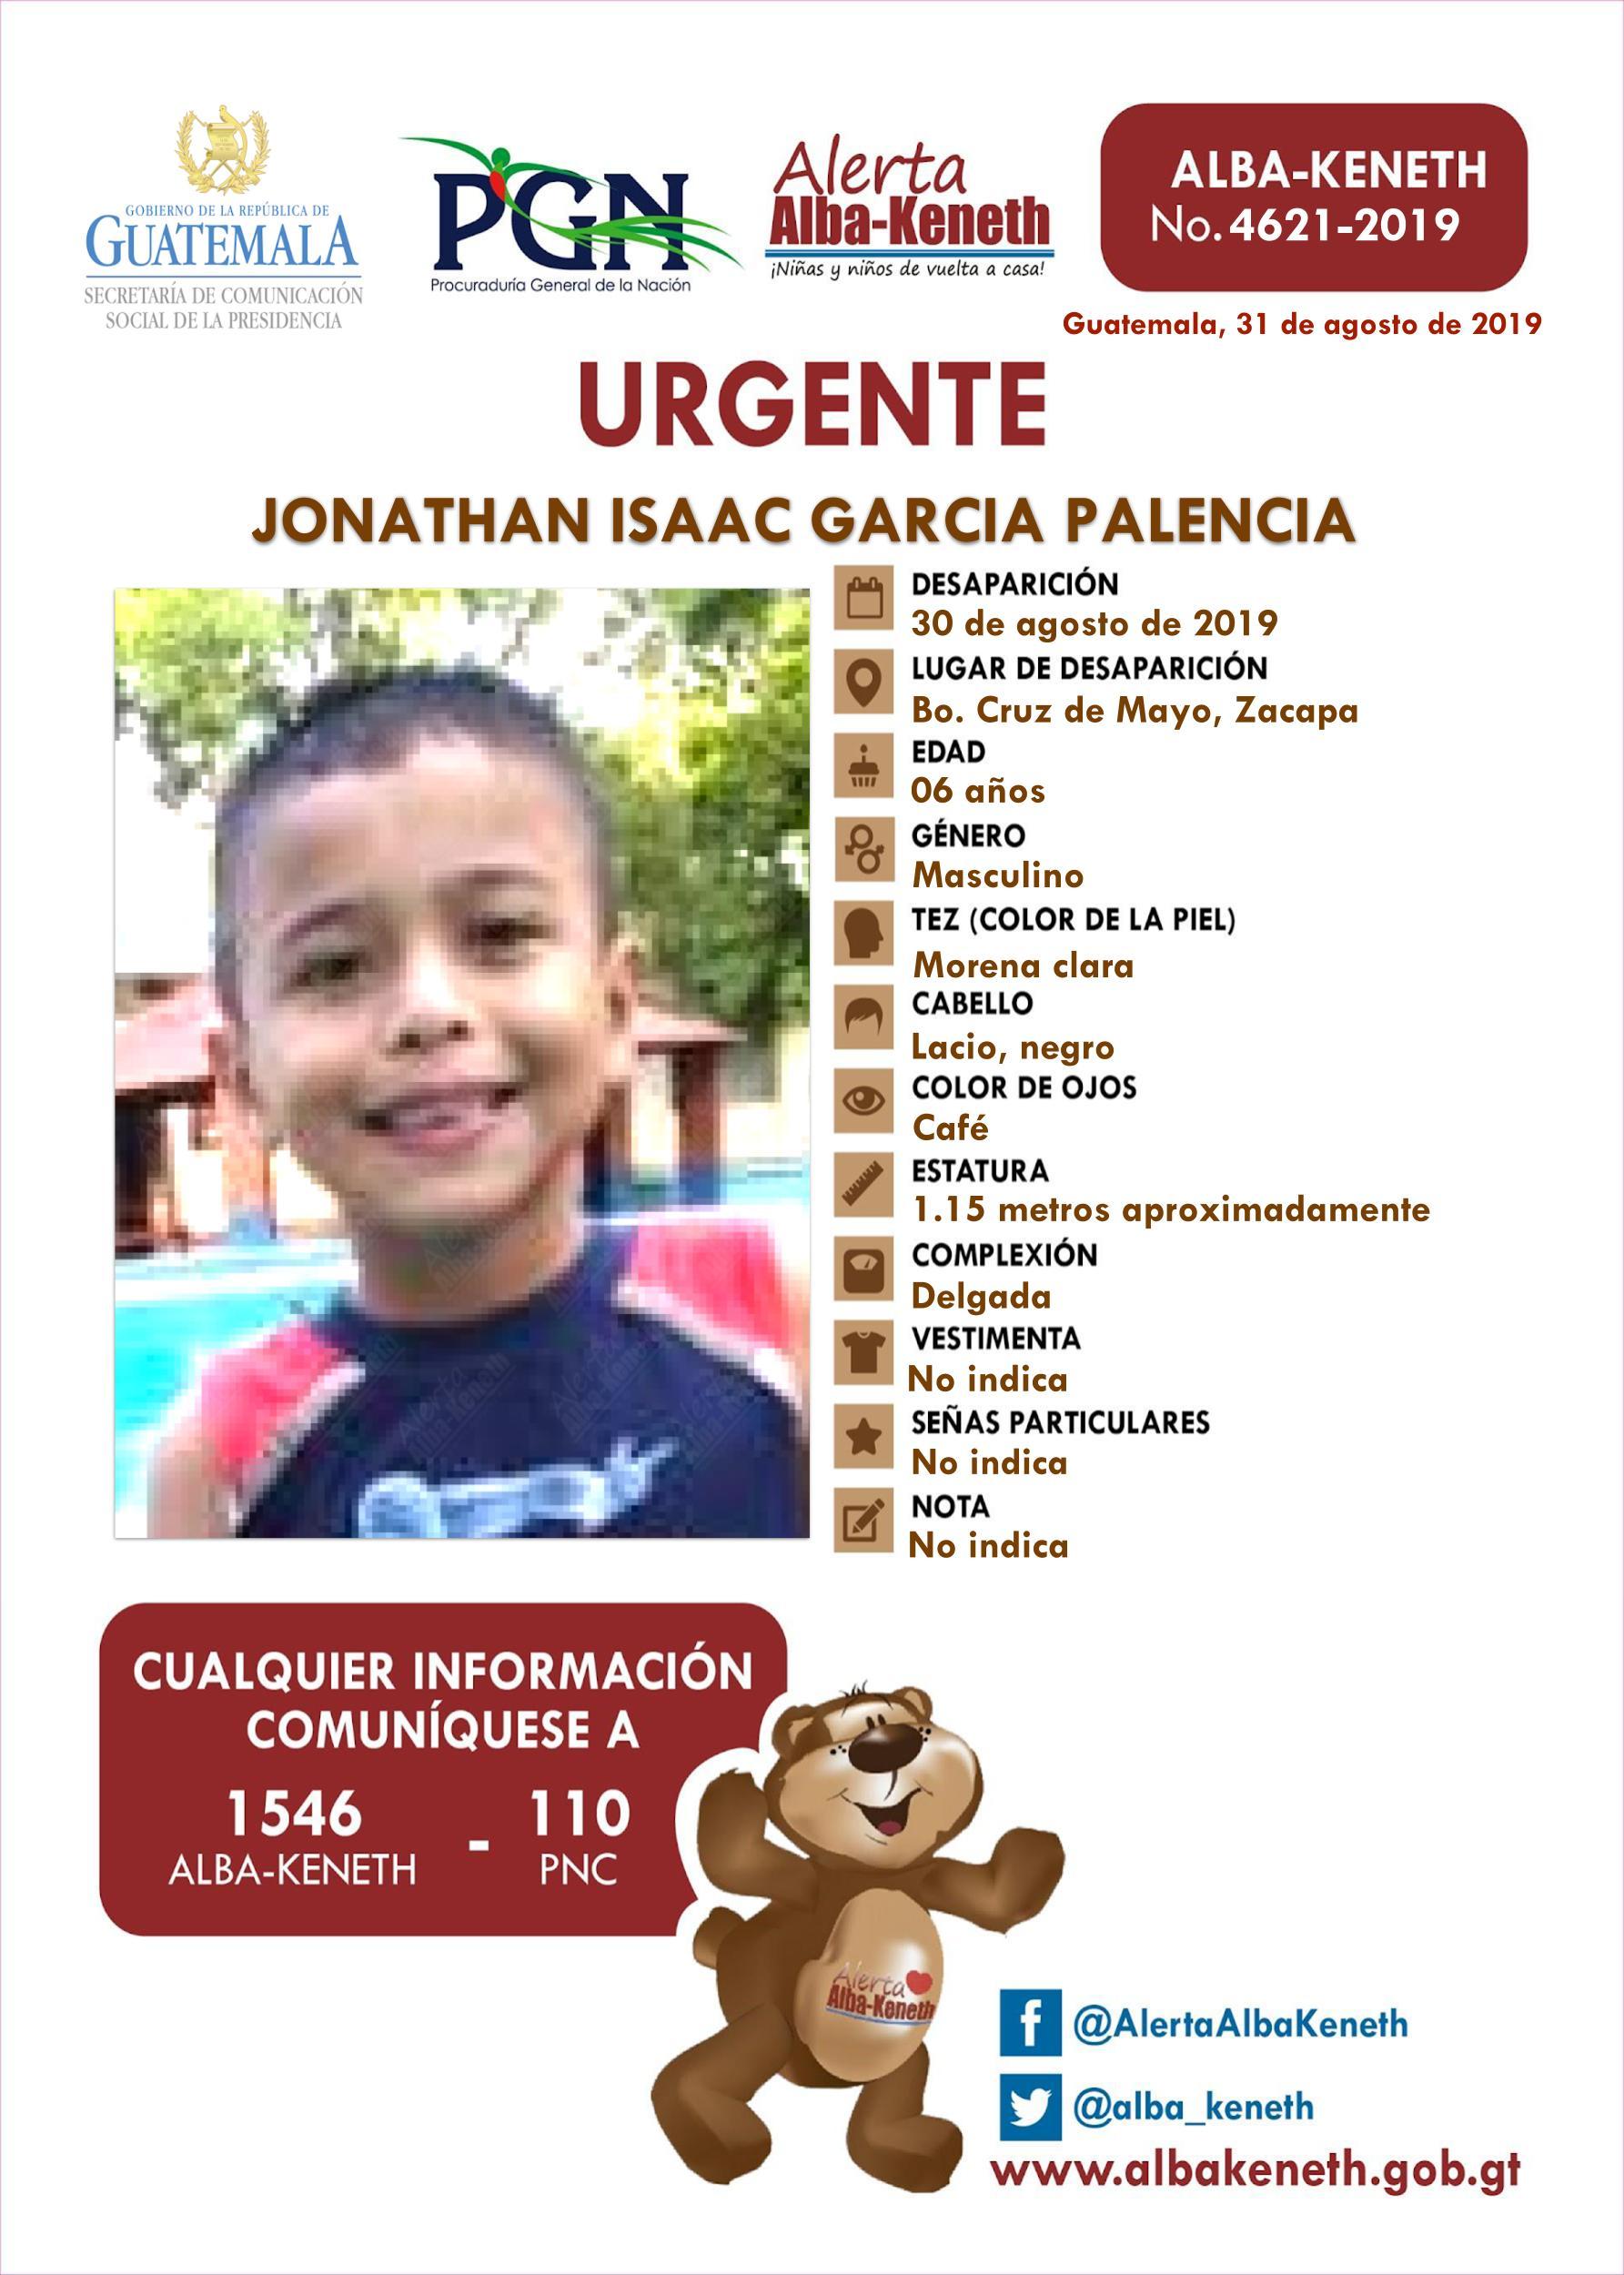 Jonathan Isaac Garcia Palencia